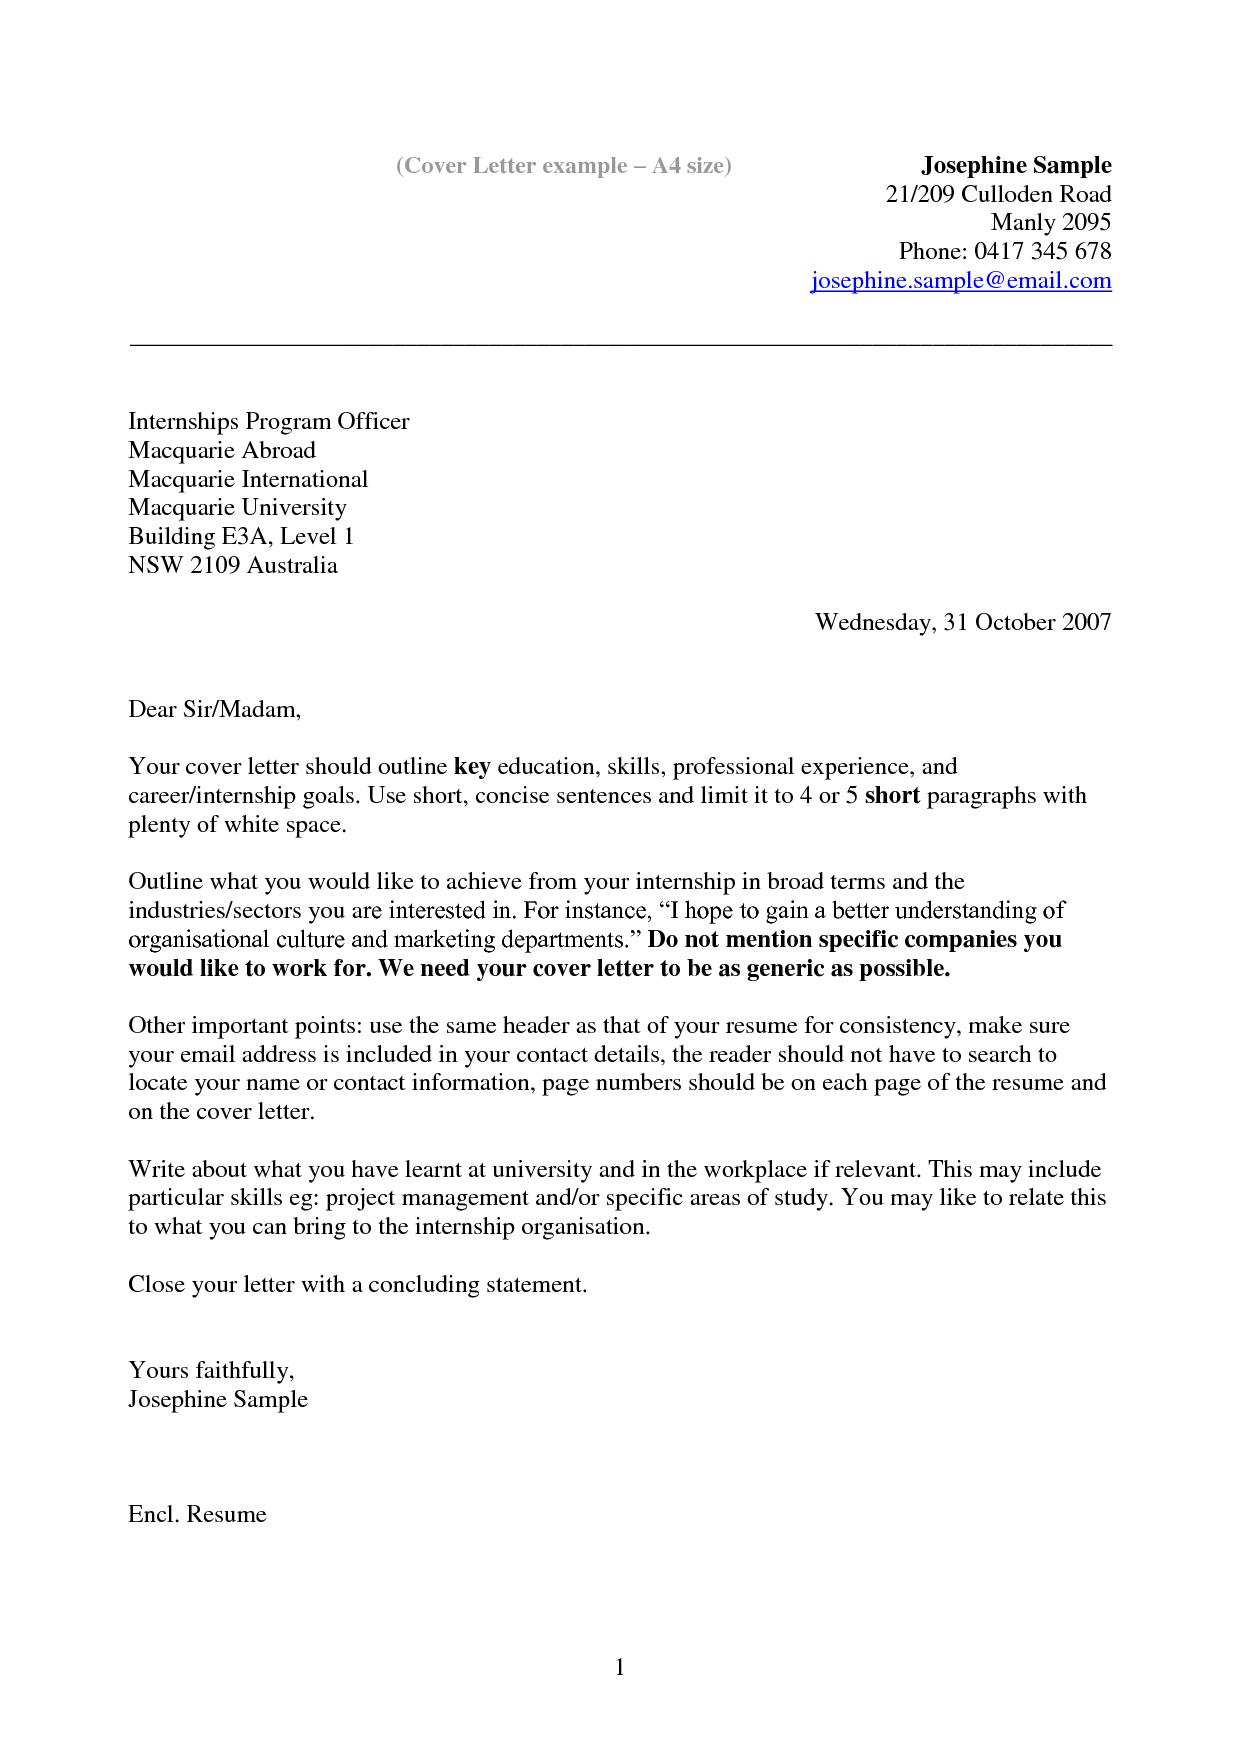 Cover Letter Template Australia